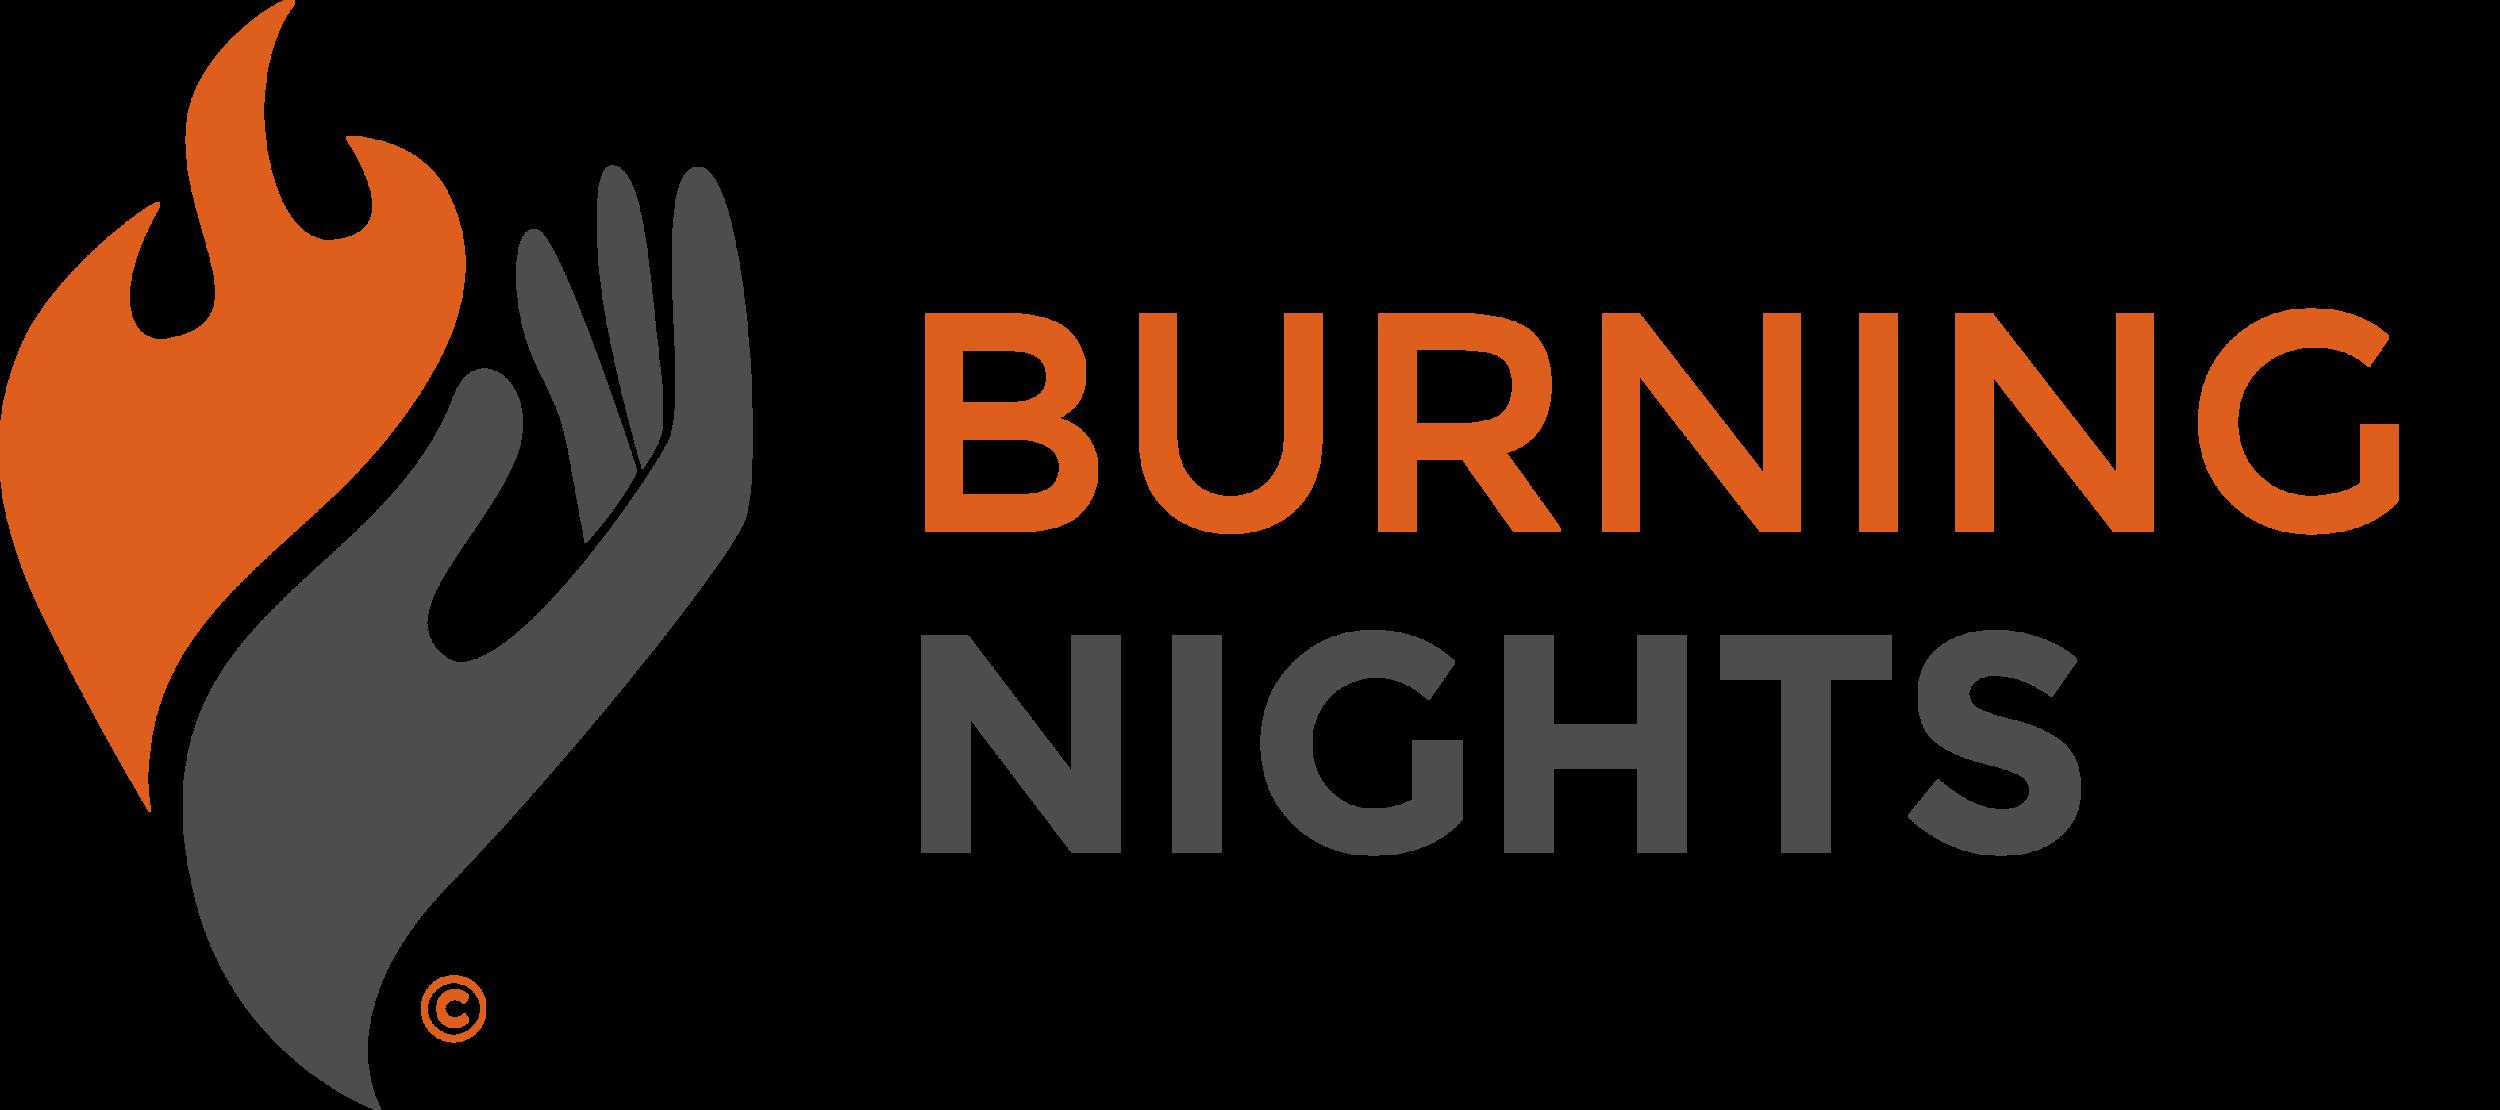 Burning Nights.png